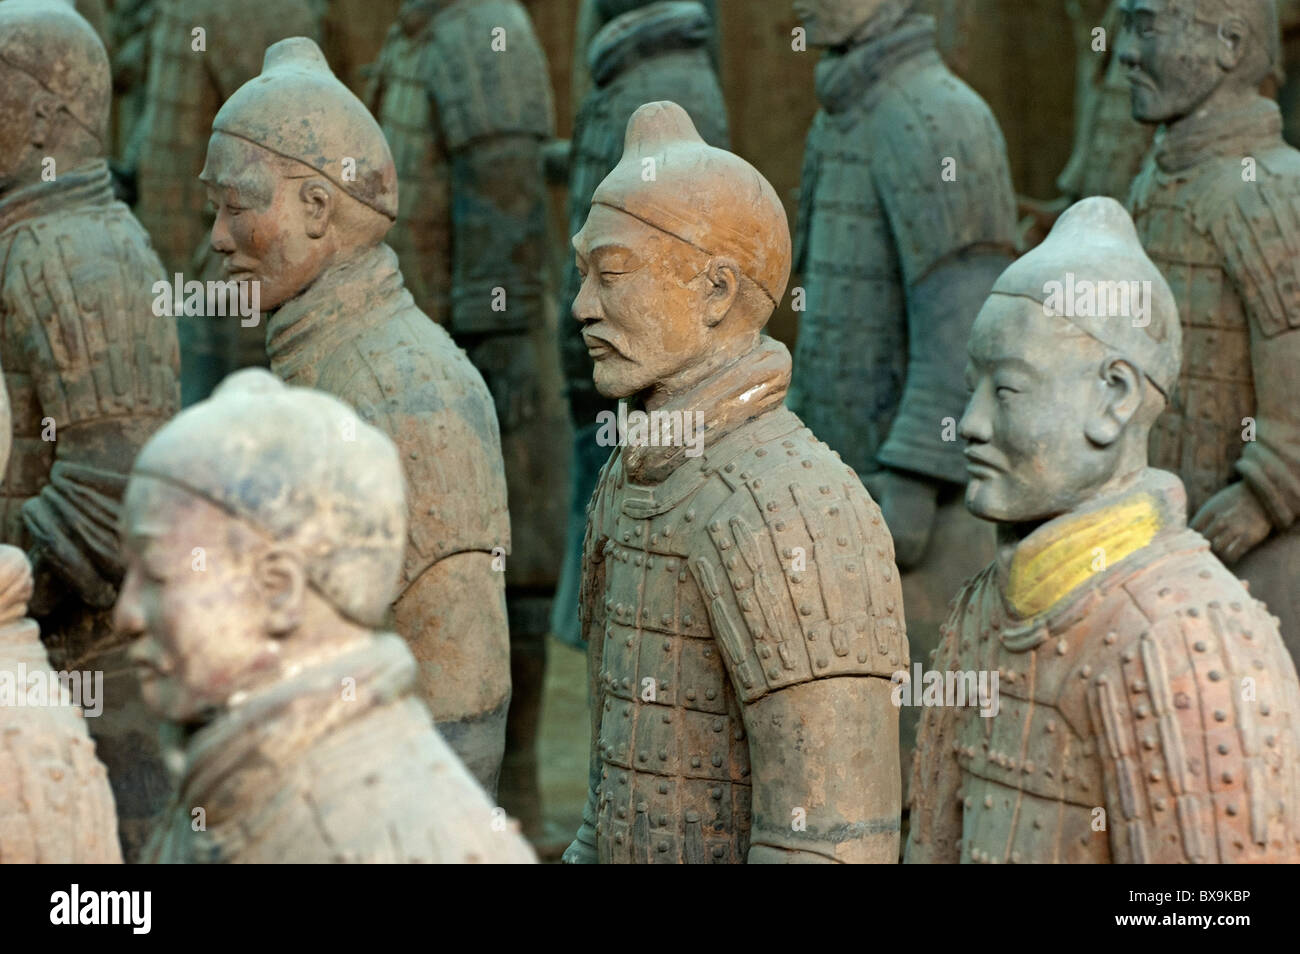 Terracotta Warriors Army, Xi'an, China - Stock Image